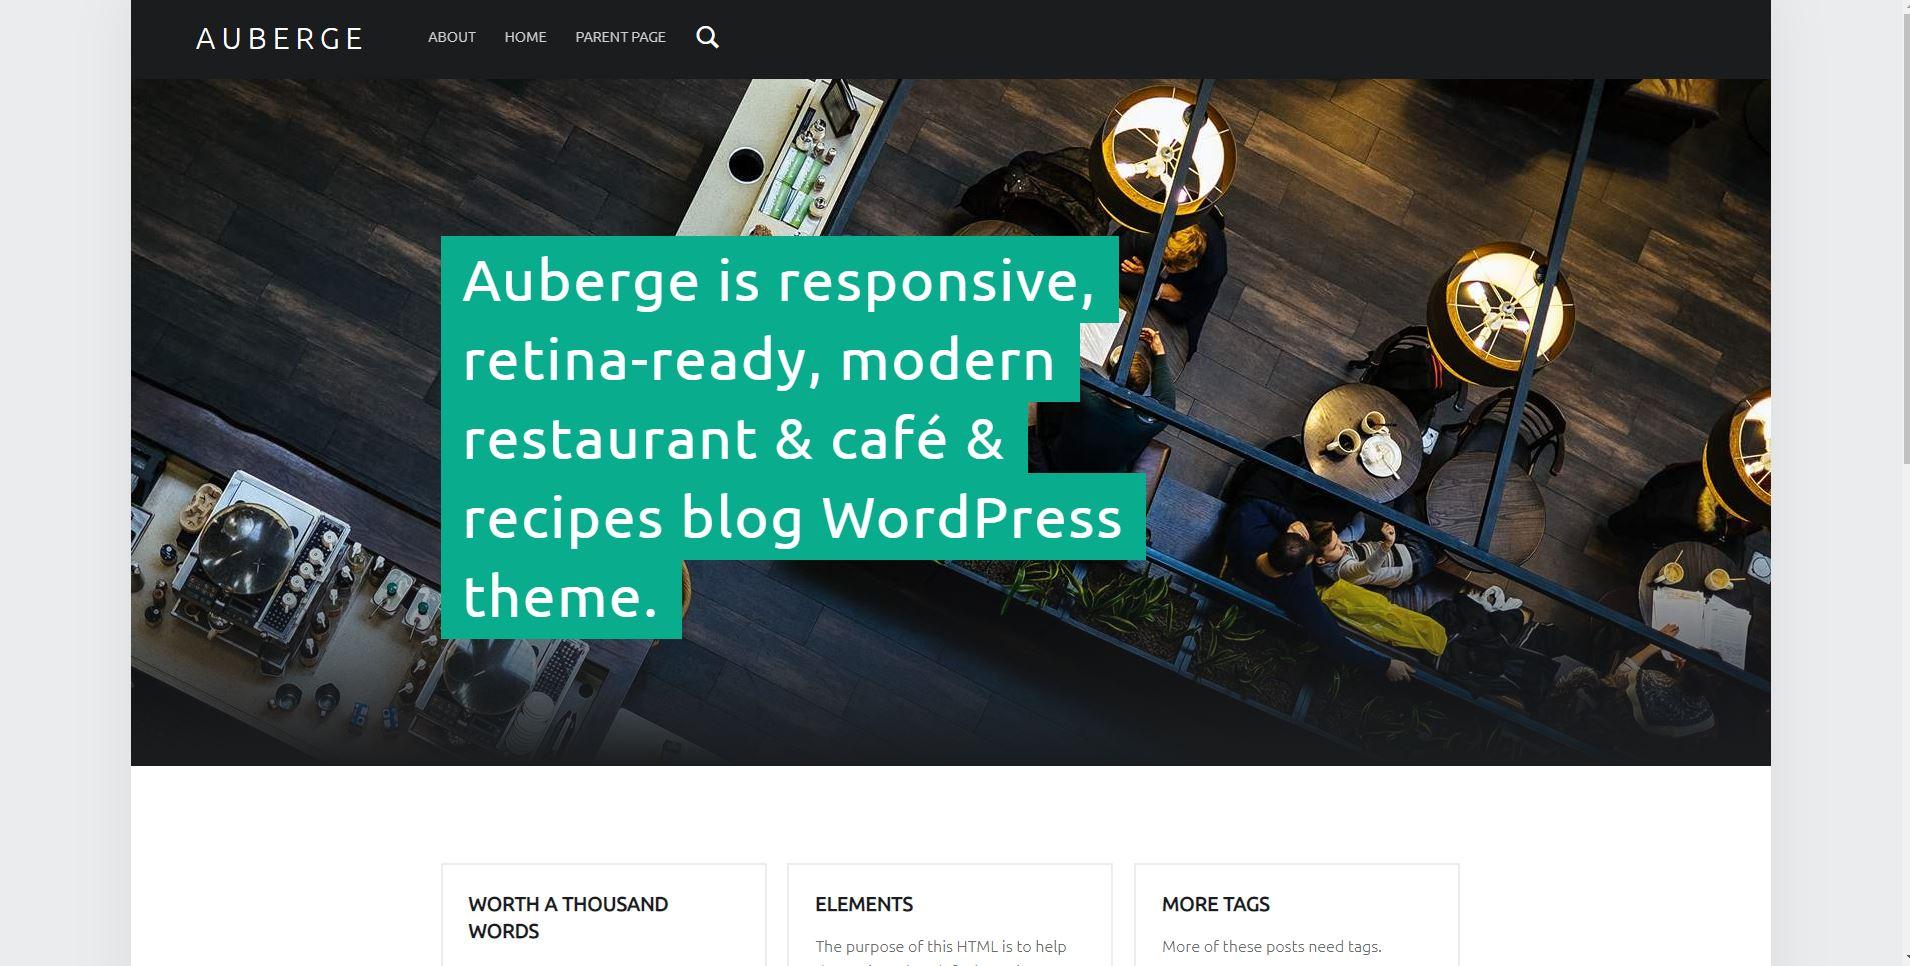 Auberge wordpress restaurant theme free